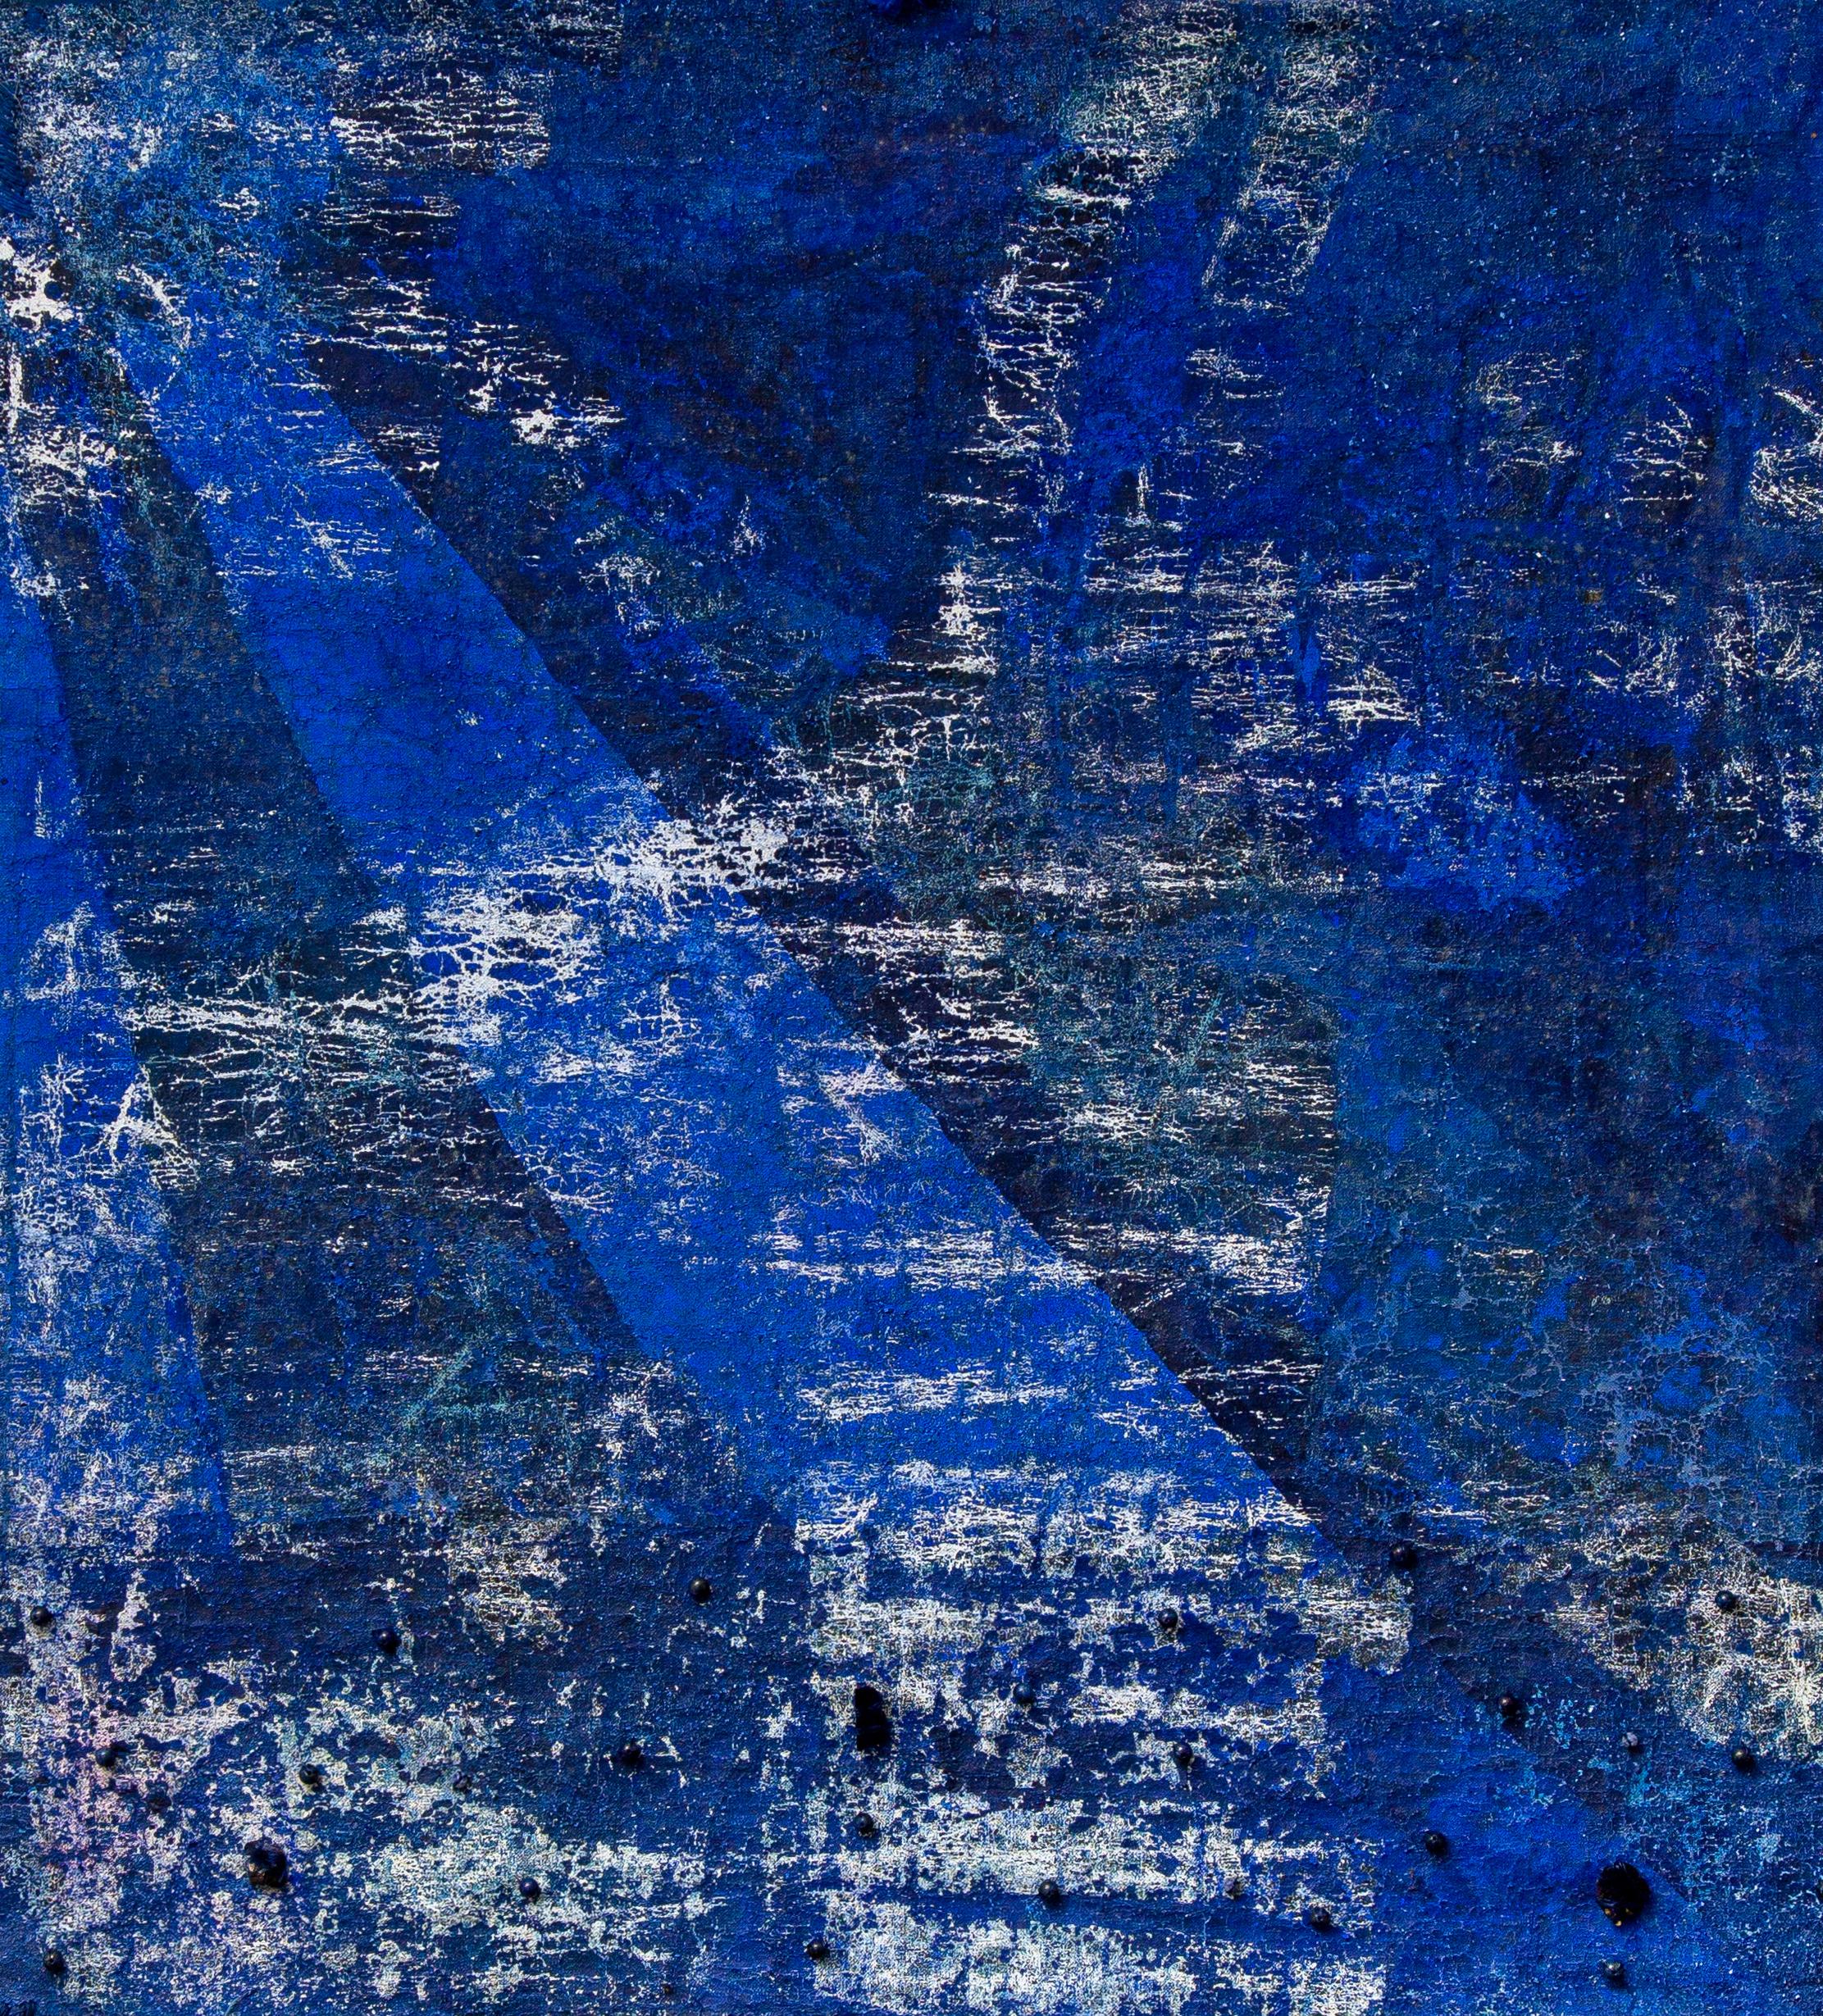 Igi Lola Ayedun, 'ESPELHO', 2019, Lapis lazuli, indigo, argan, wax, silk, corn with azurite and lapis lazuli 39.27 x 34.64 in 82 x 90 cm. Courtesy of HOA Galeria